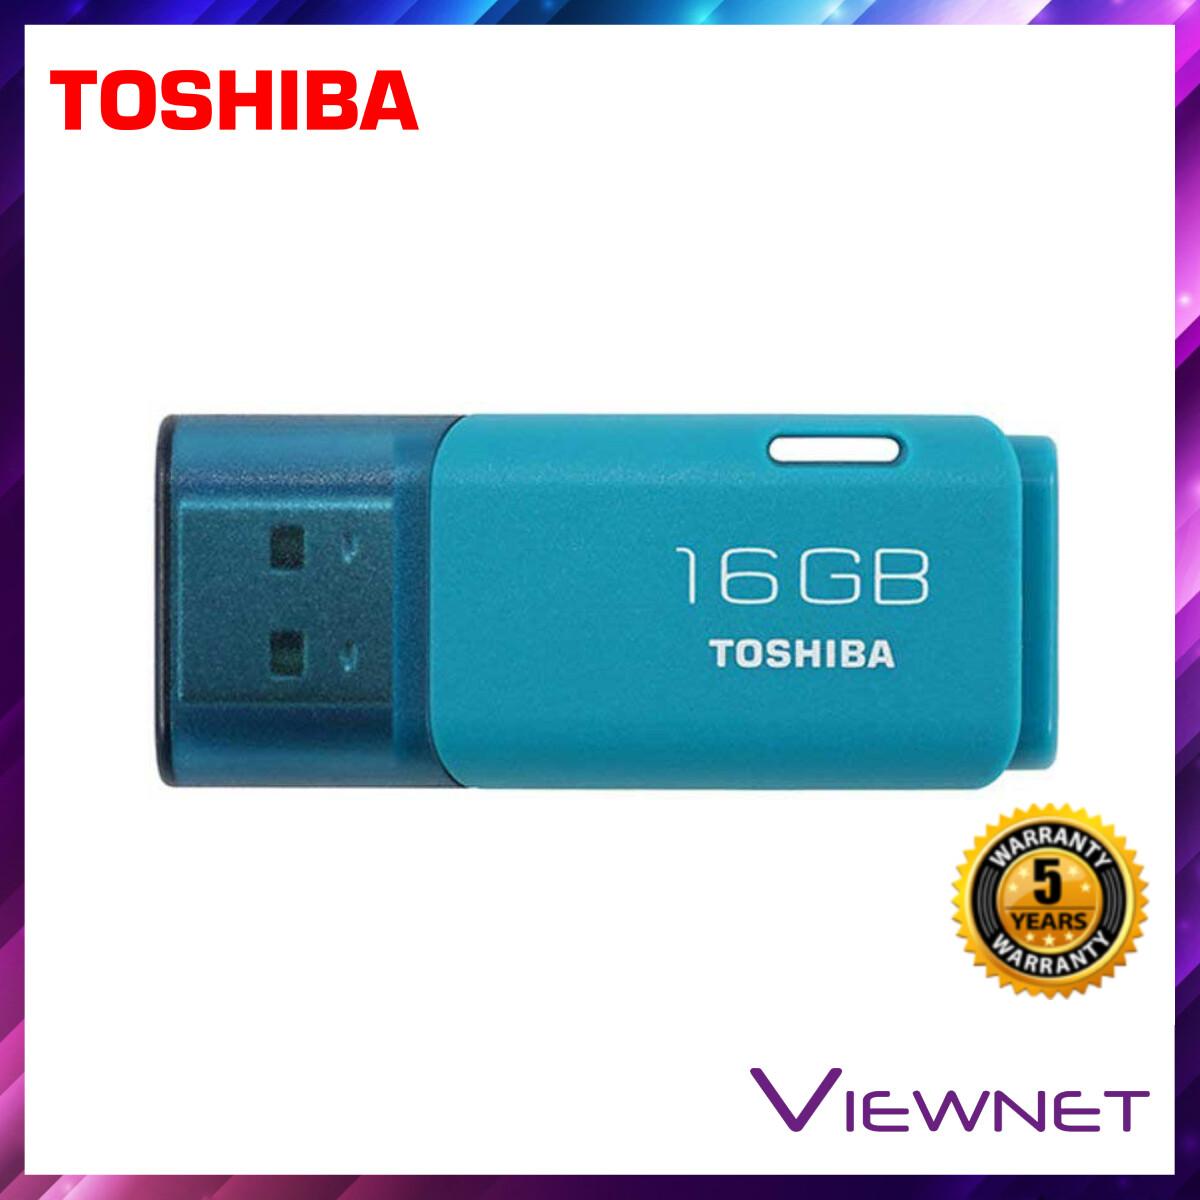 Toshiba Hayabusa Flash Drive 16GB/32GB USB2.0 (White/Blue)